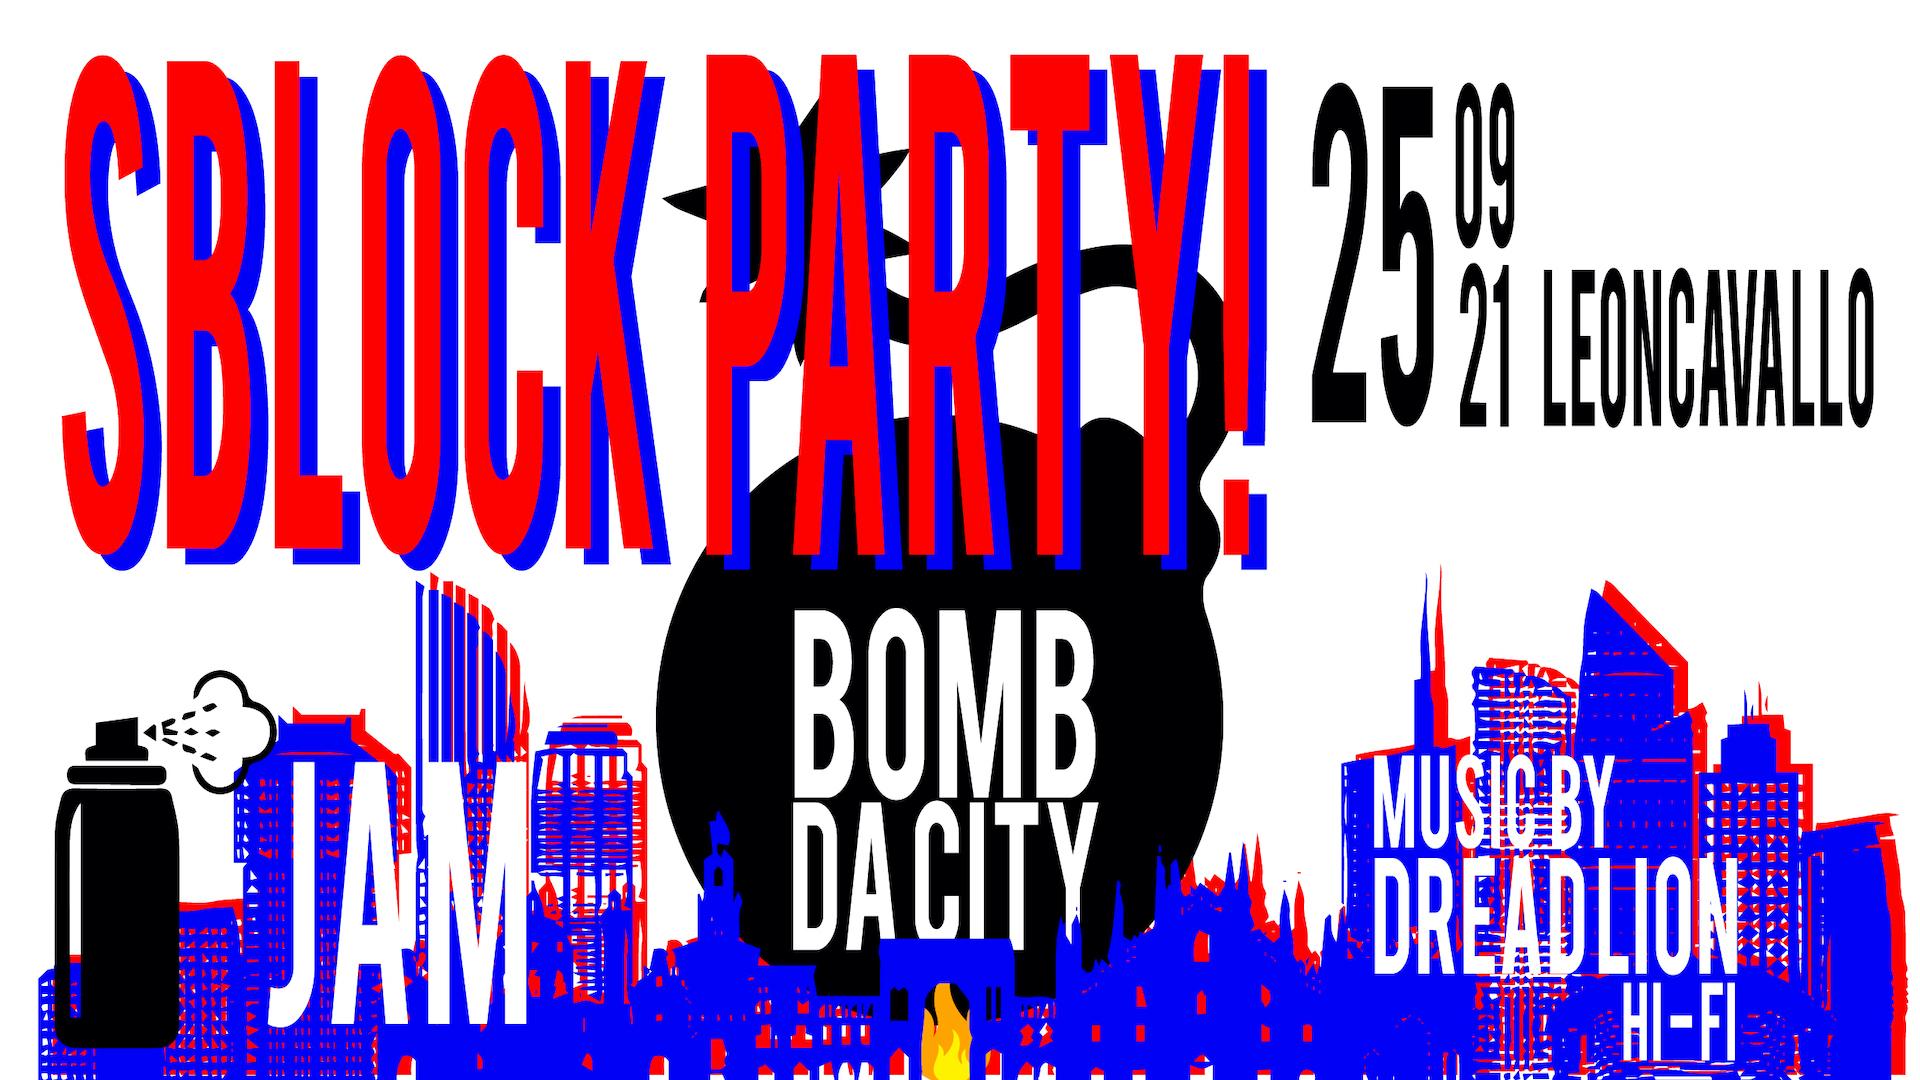 SBLOCK PARTY! - BOMB DA CITY